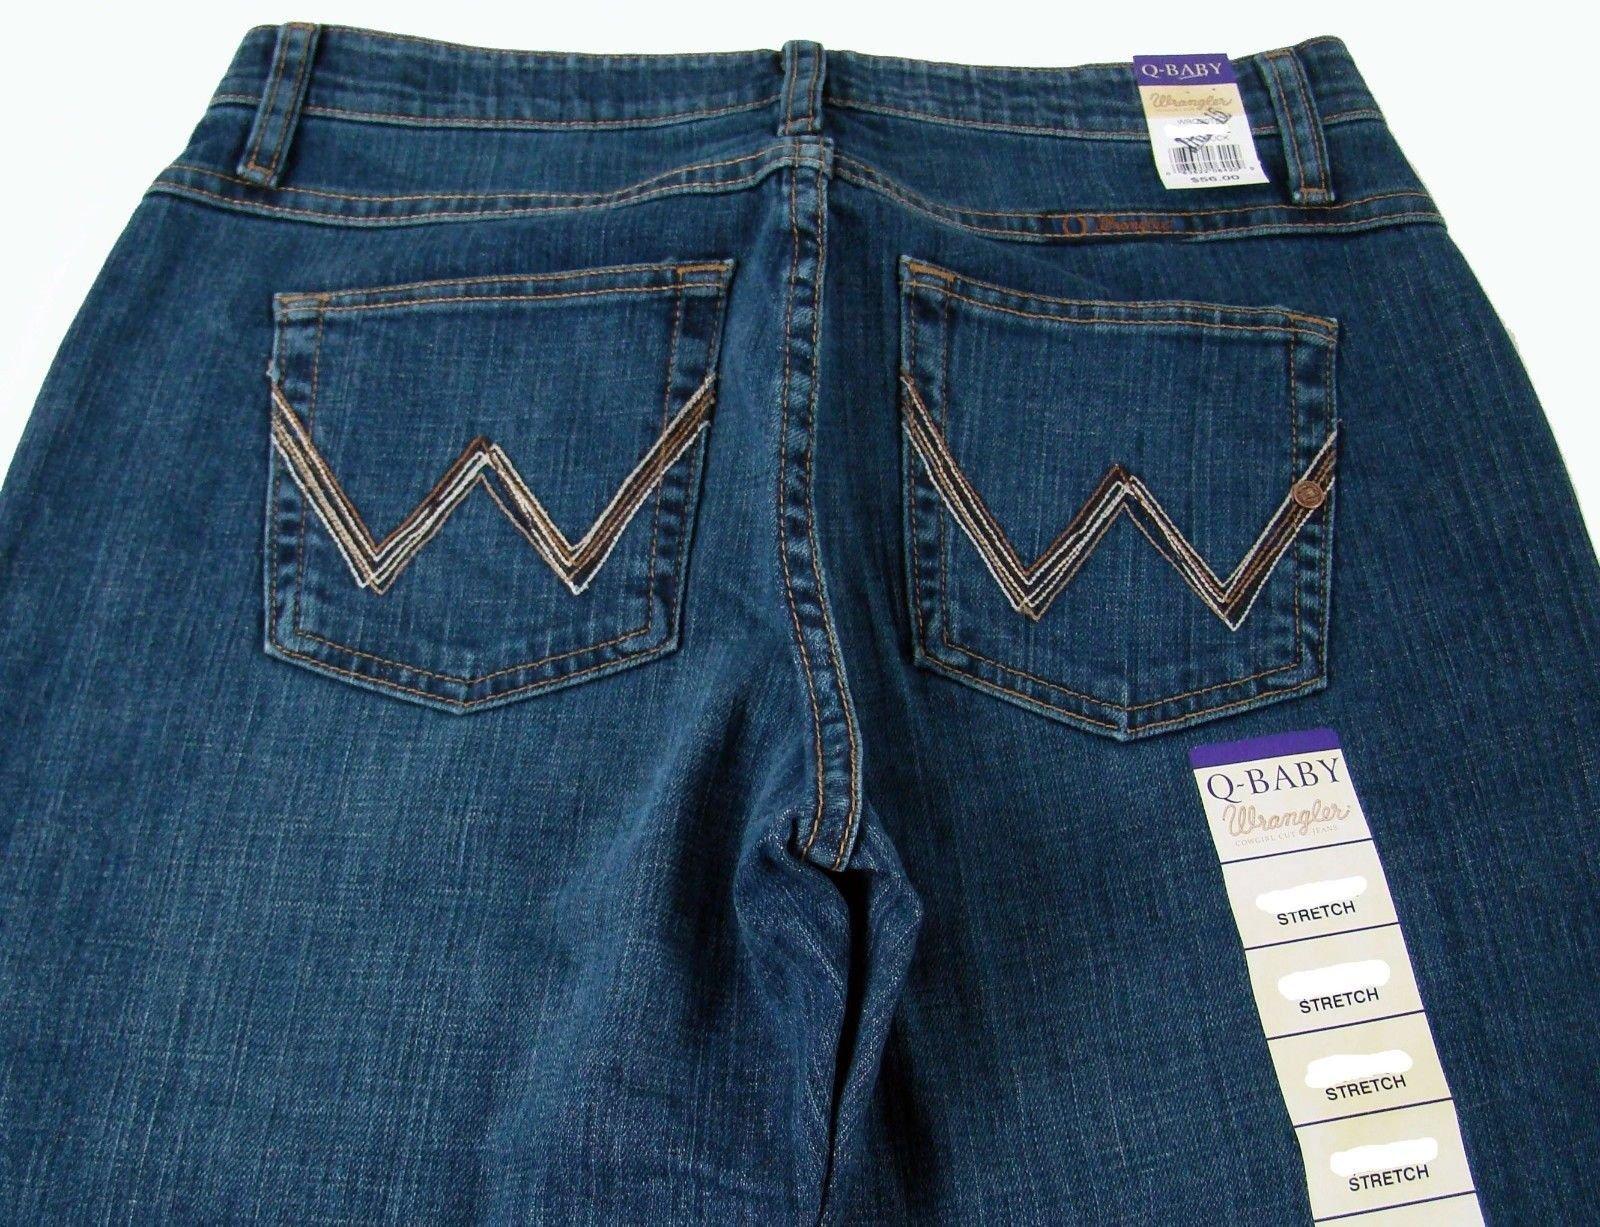 e8b6aea3 Womens Wrangler Q-Baby Mid Rise Boot Cut Tuff Buck Jeans WRQ20TB Choose  Size. Product Details